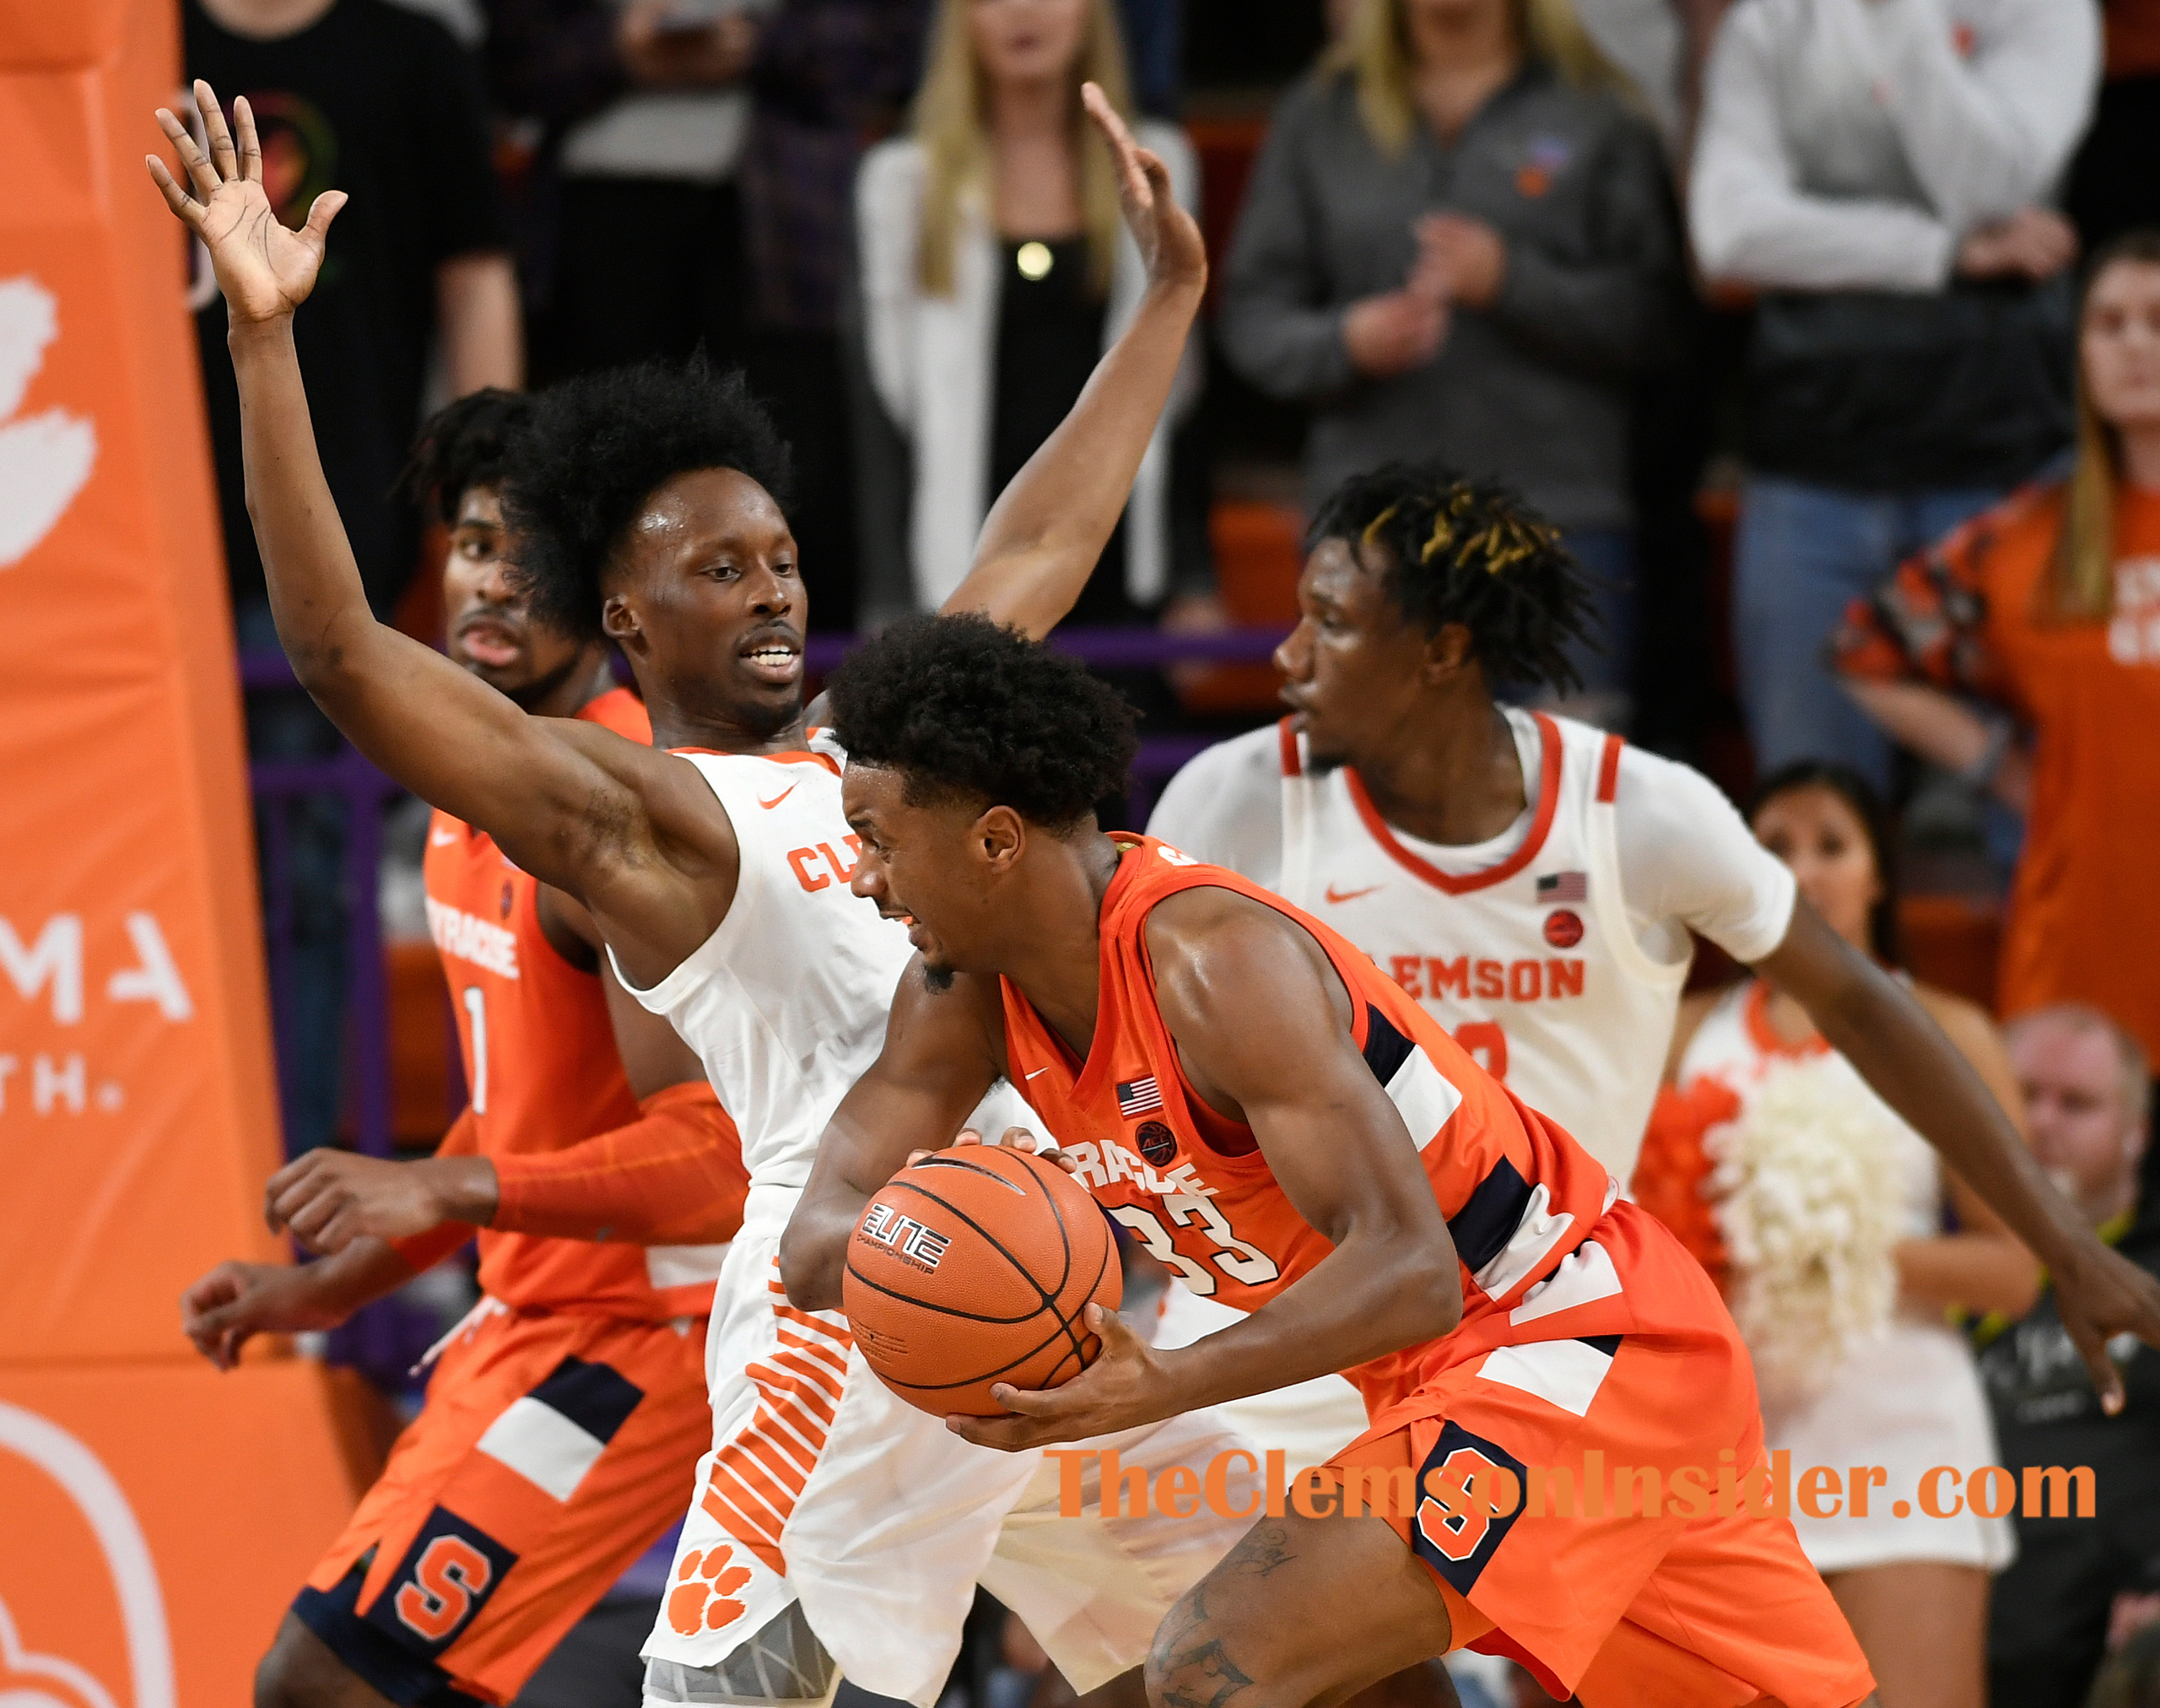 Clemson plays Syracuse Tuesday, January 28, 2020 at Clemson's Littlejohn Coliseum. Bart Boatwright/The Clemson Insider